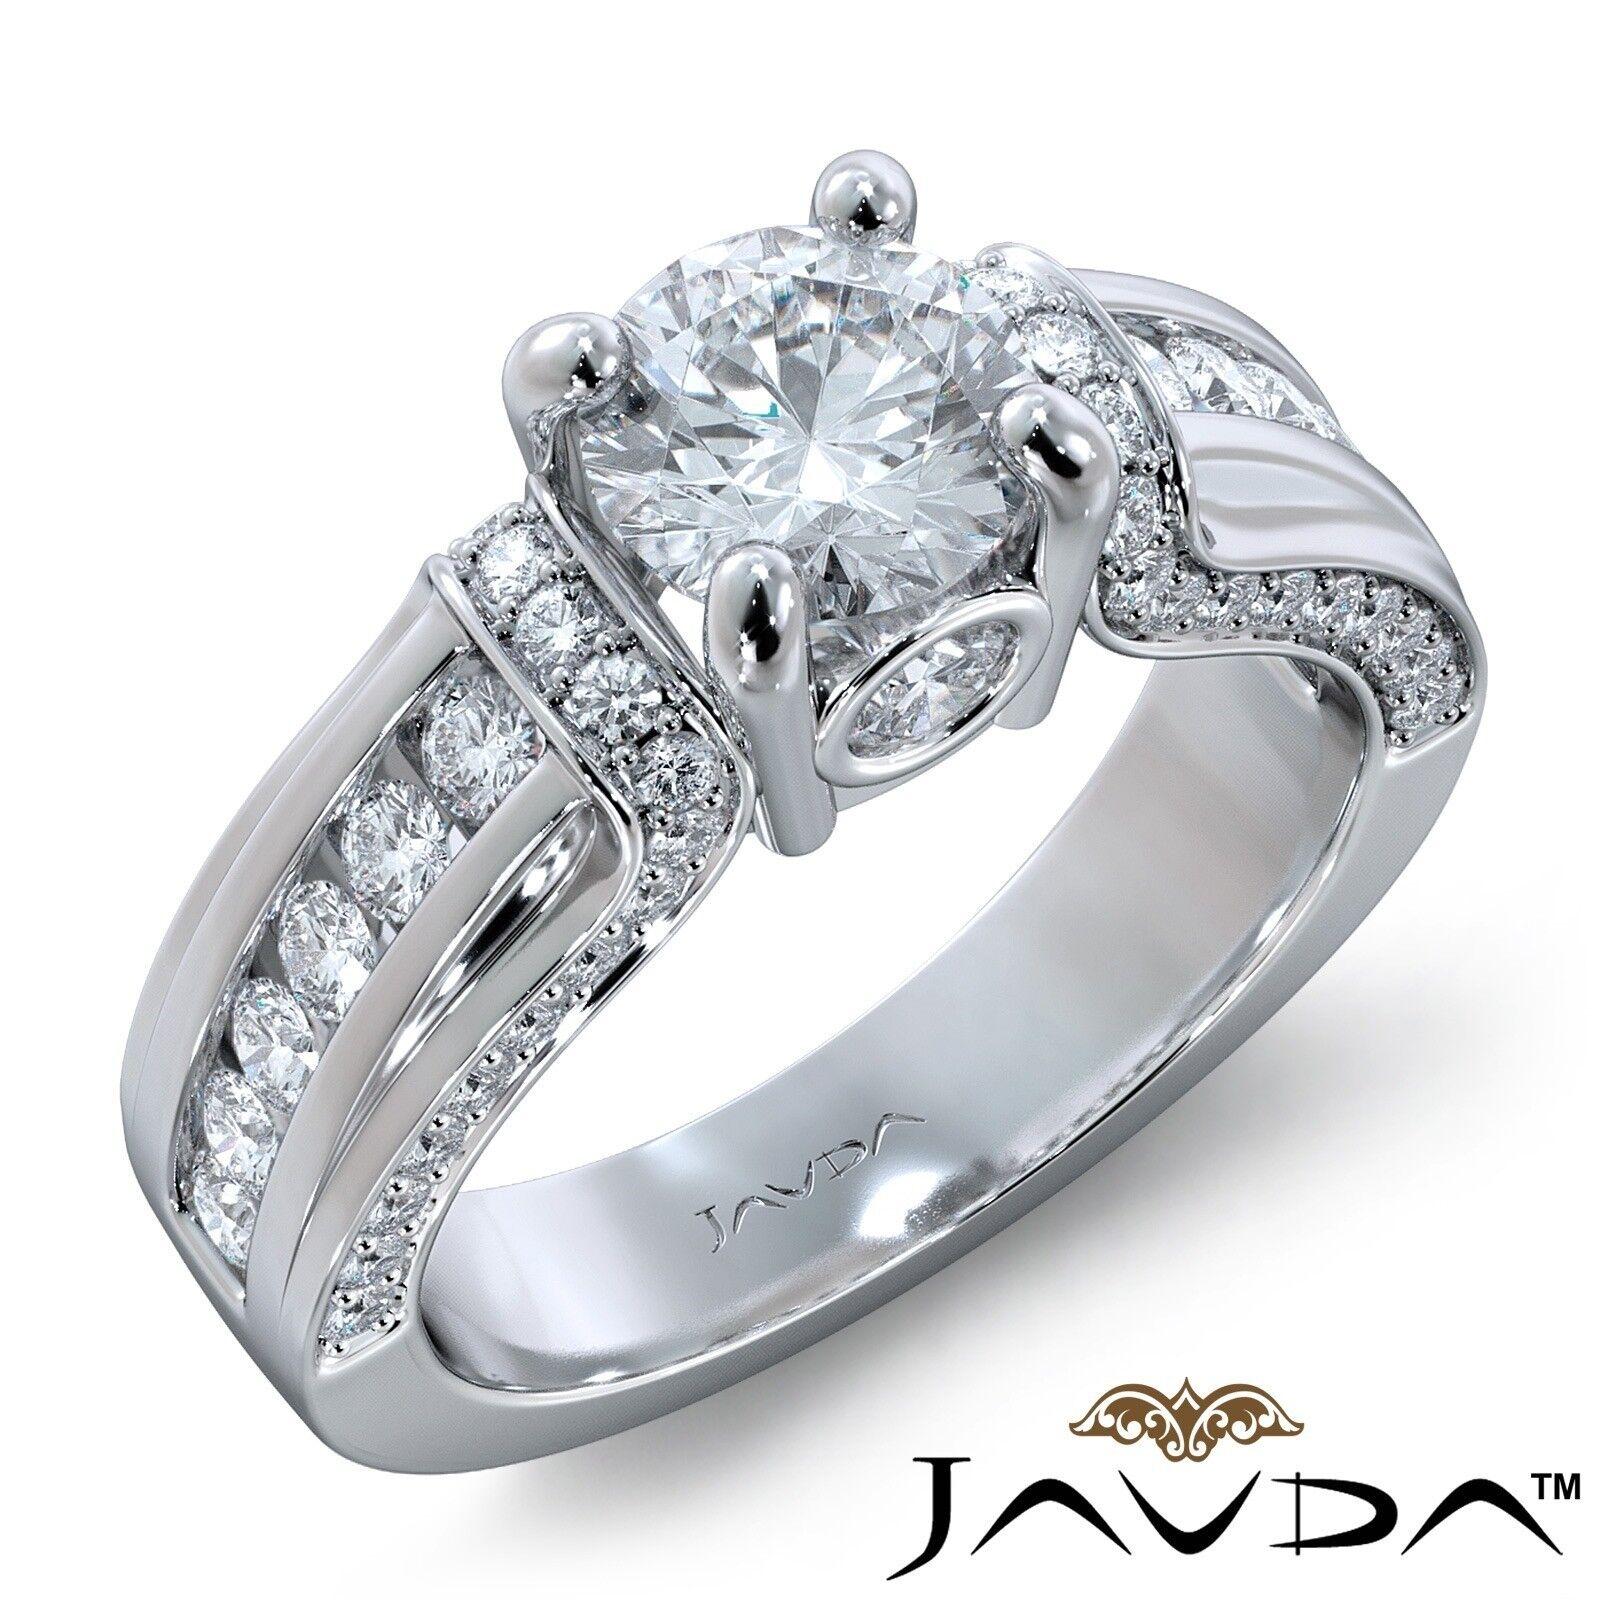 2.1ctw Channel Set Sidestone Round Diamond Engagement Ring GIA G-VS1 White Gold